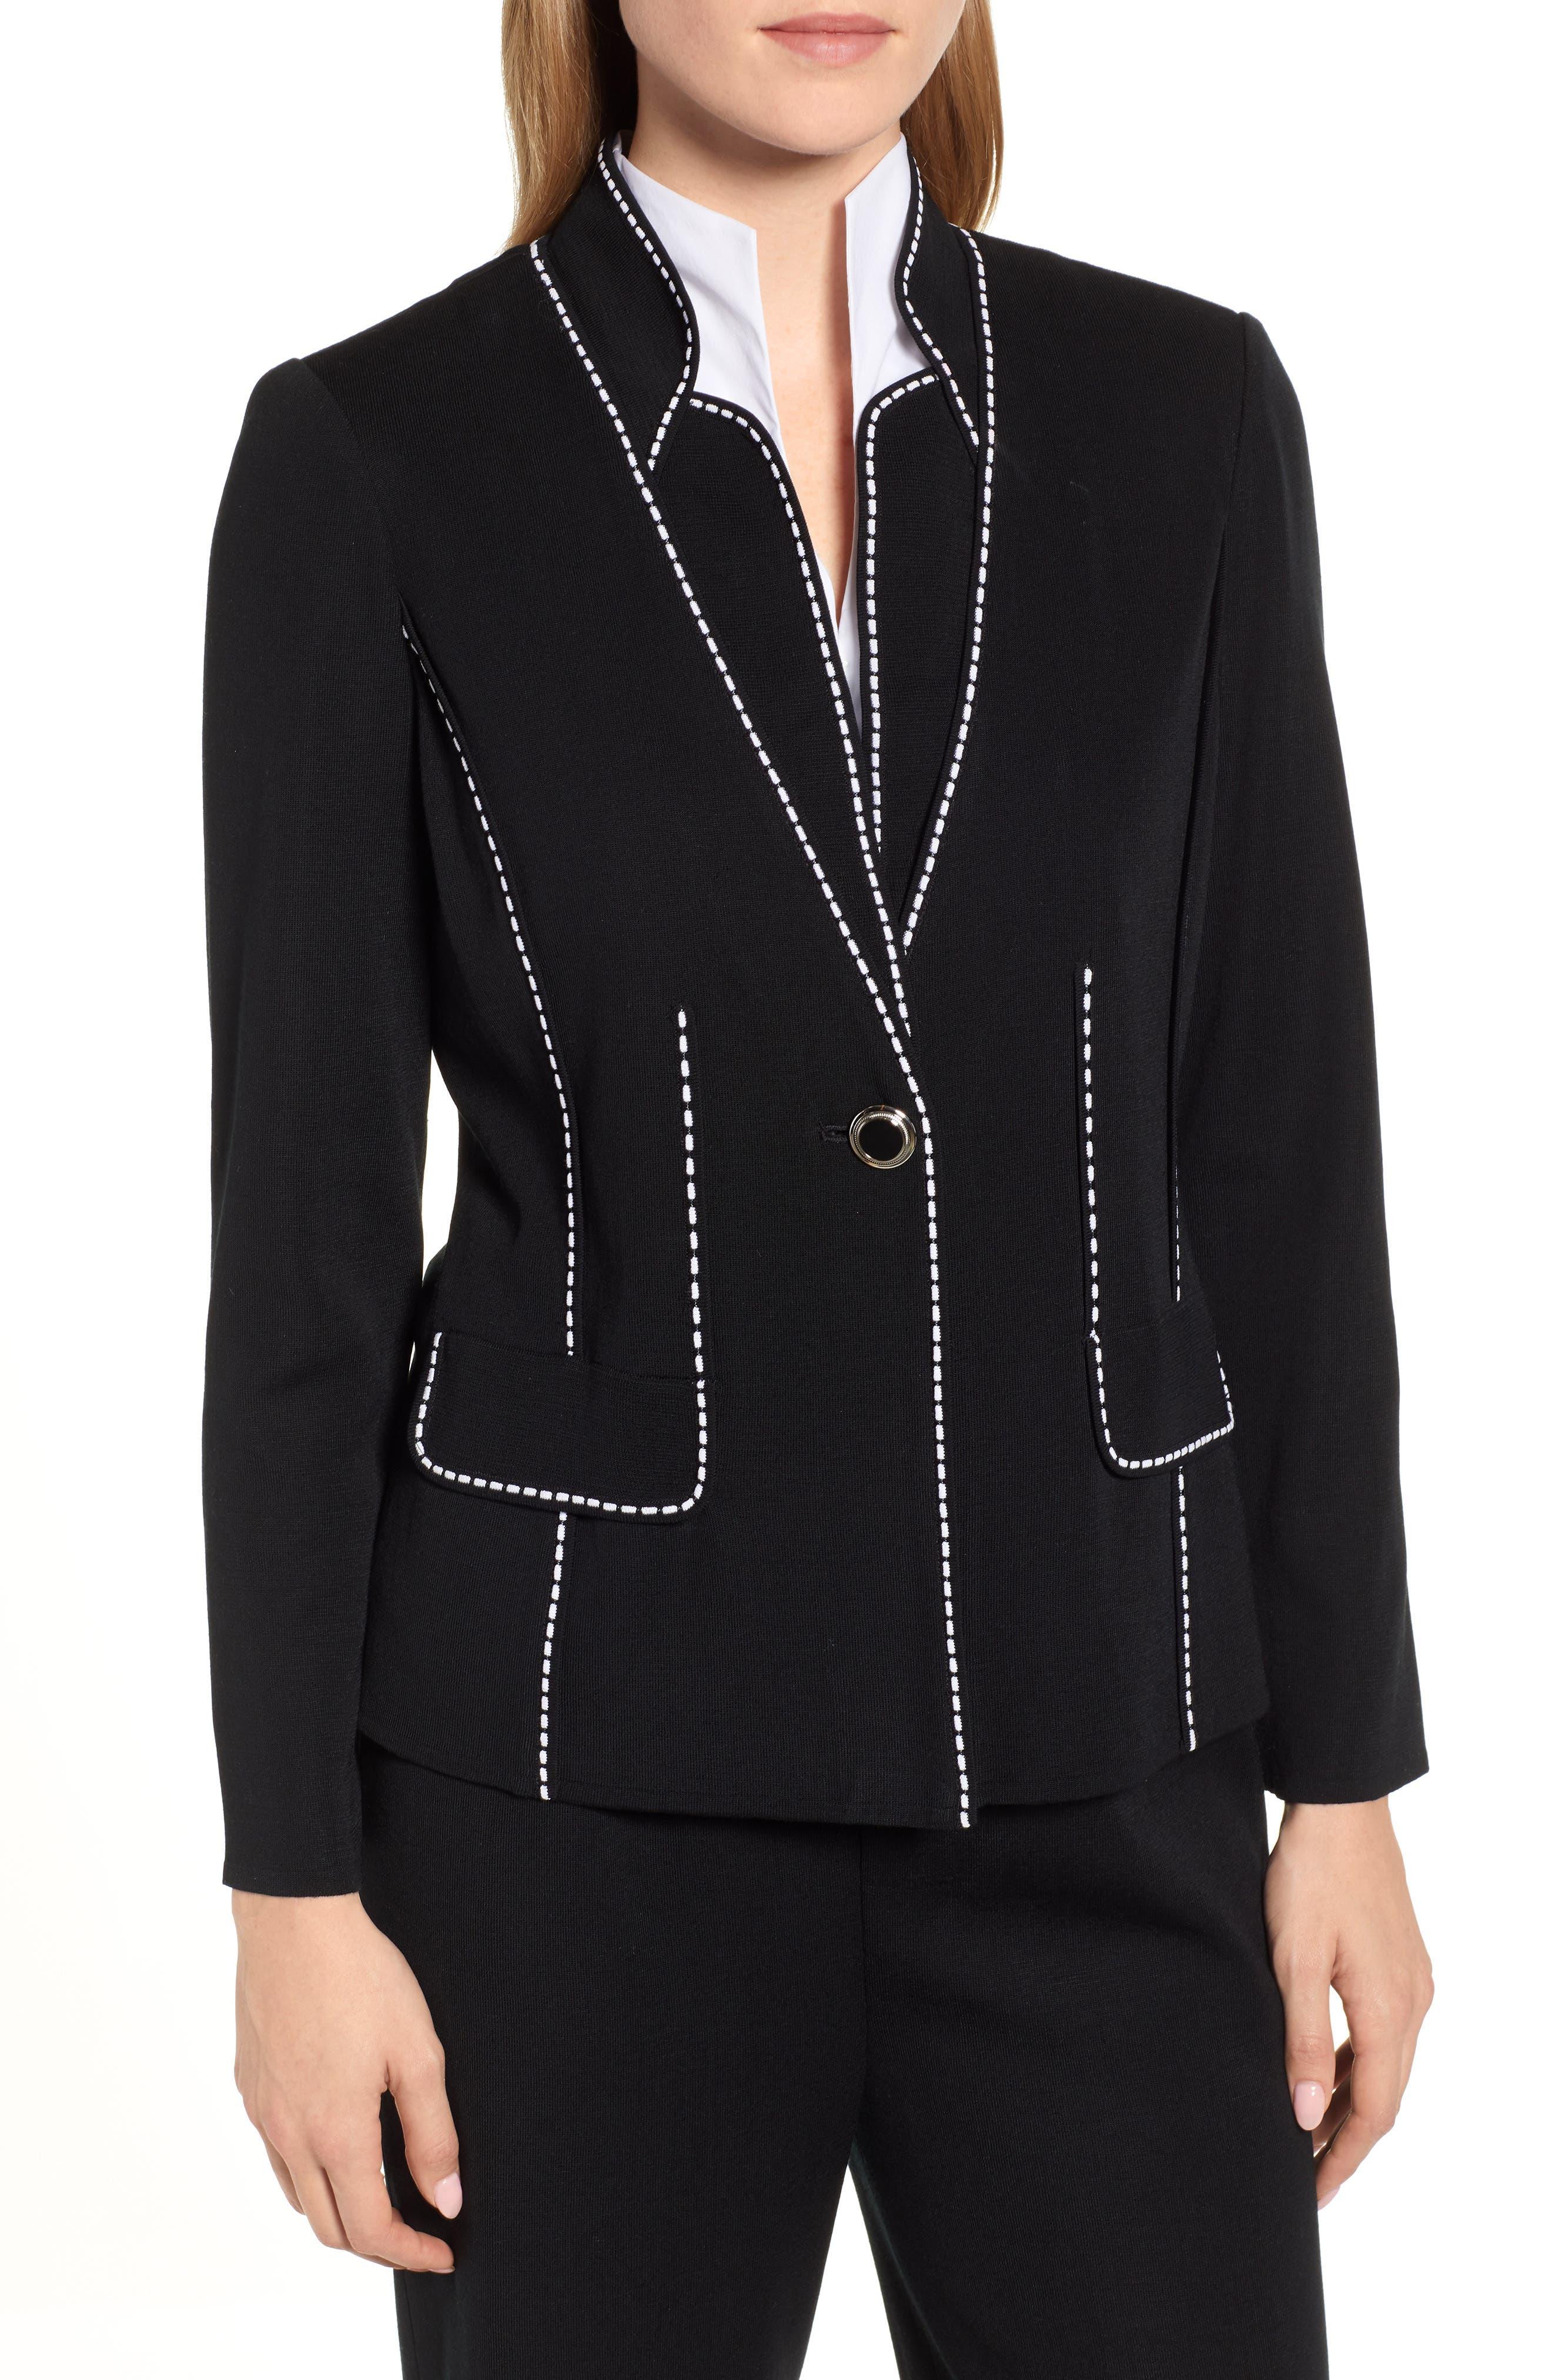 Contrast Jacquard Sweater Jacket, Main, color, BLACK/ WHITE